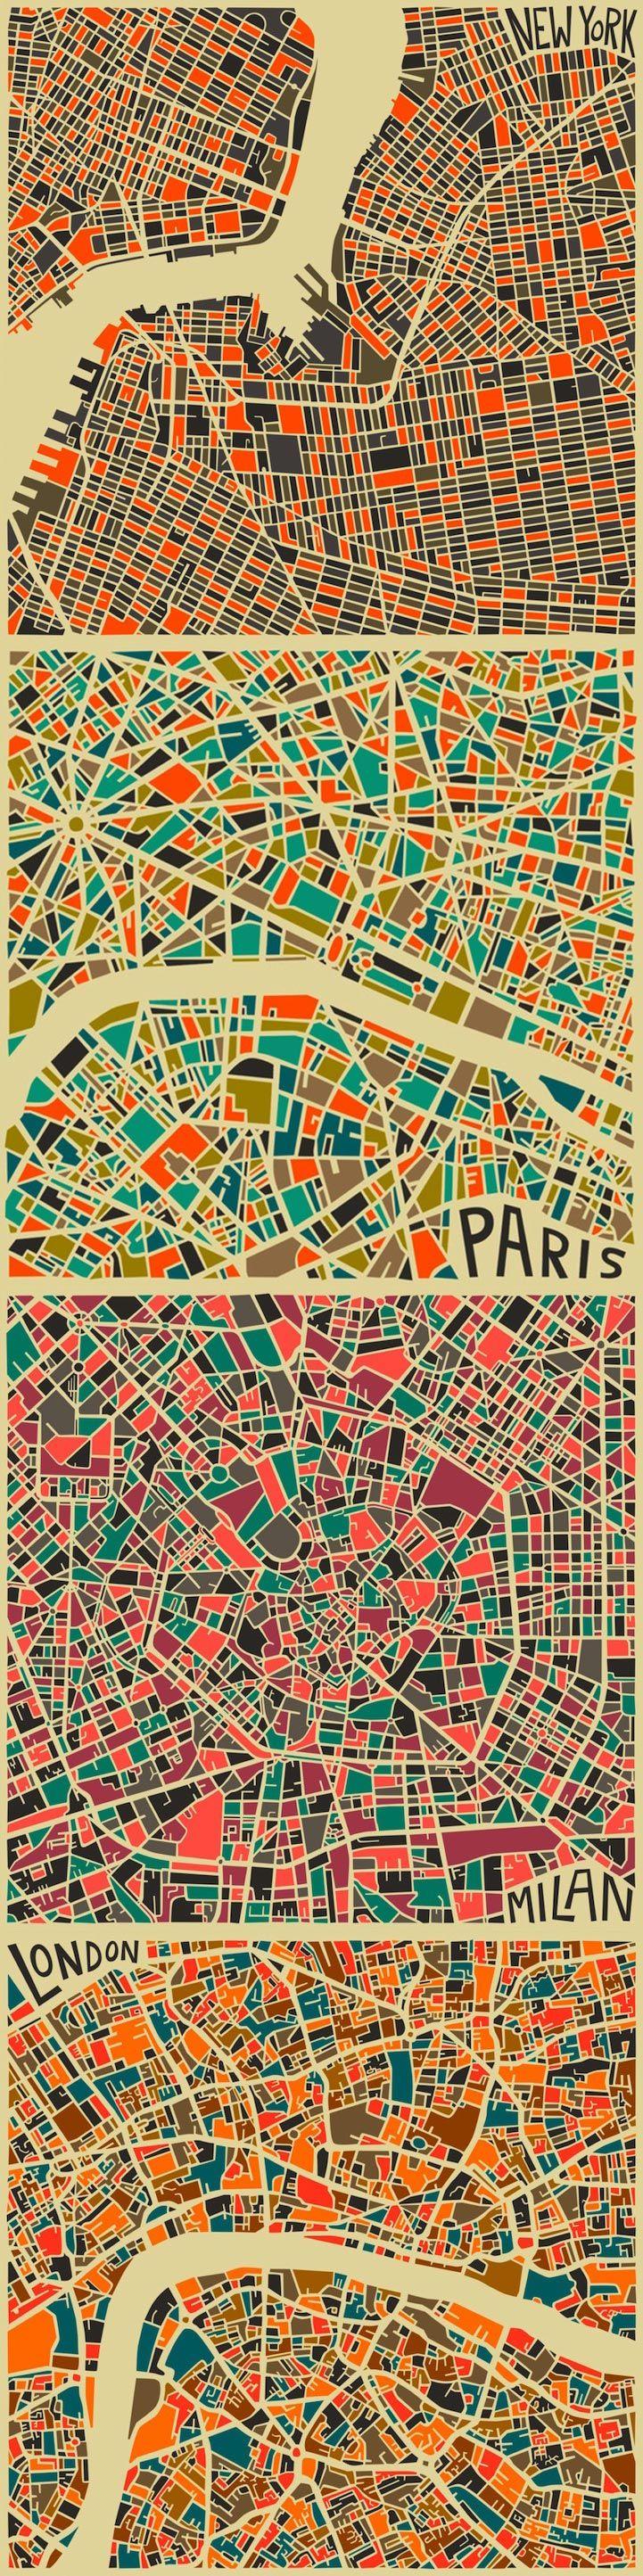 City maps by Jazzberry Blue